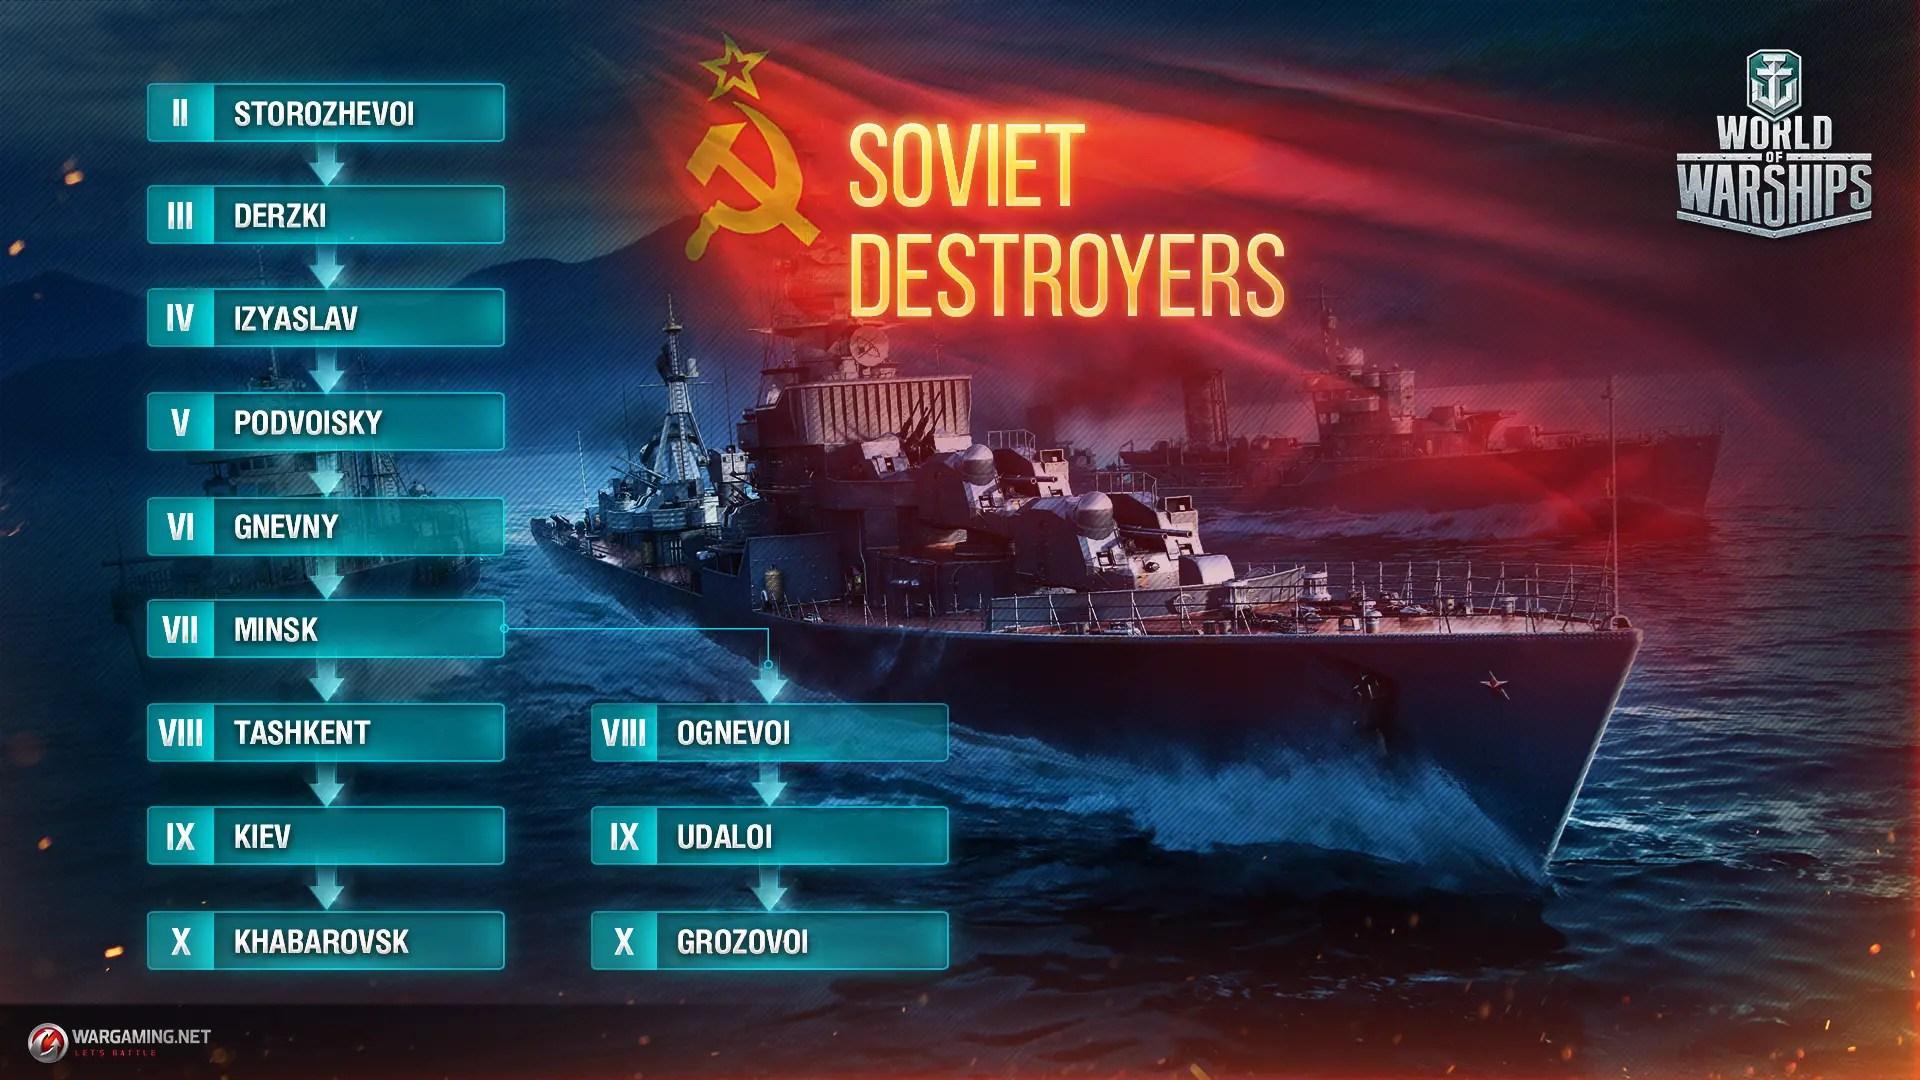 Izyaslav: a selection of sites